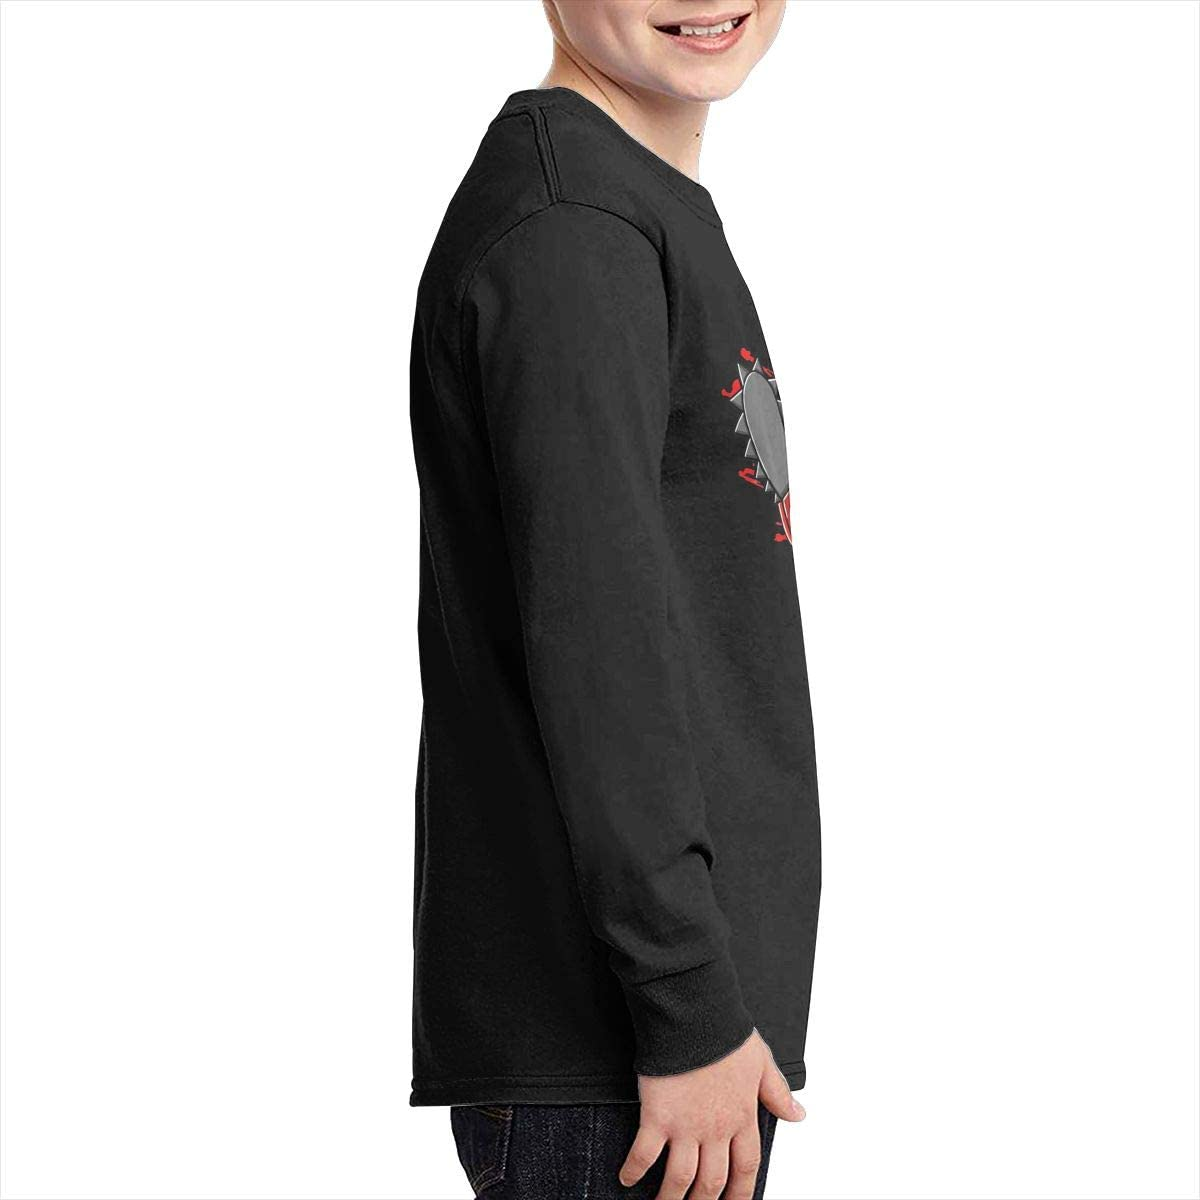 RhteGui Slashy Boys /& Girls Junior Vintage Long Sleeve T-Shirt Black